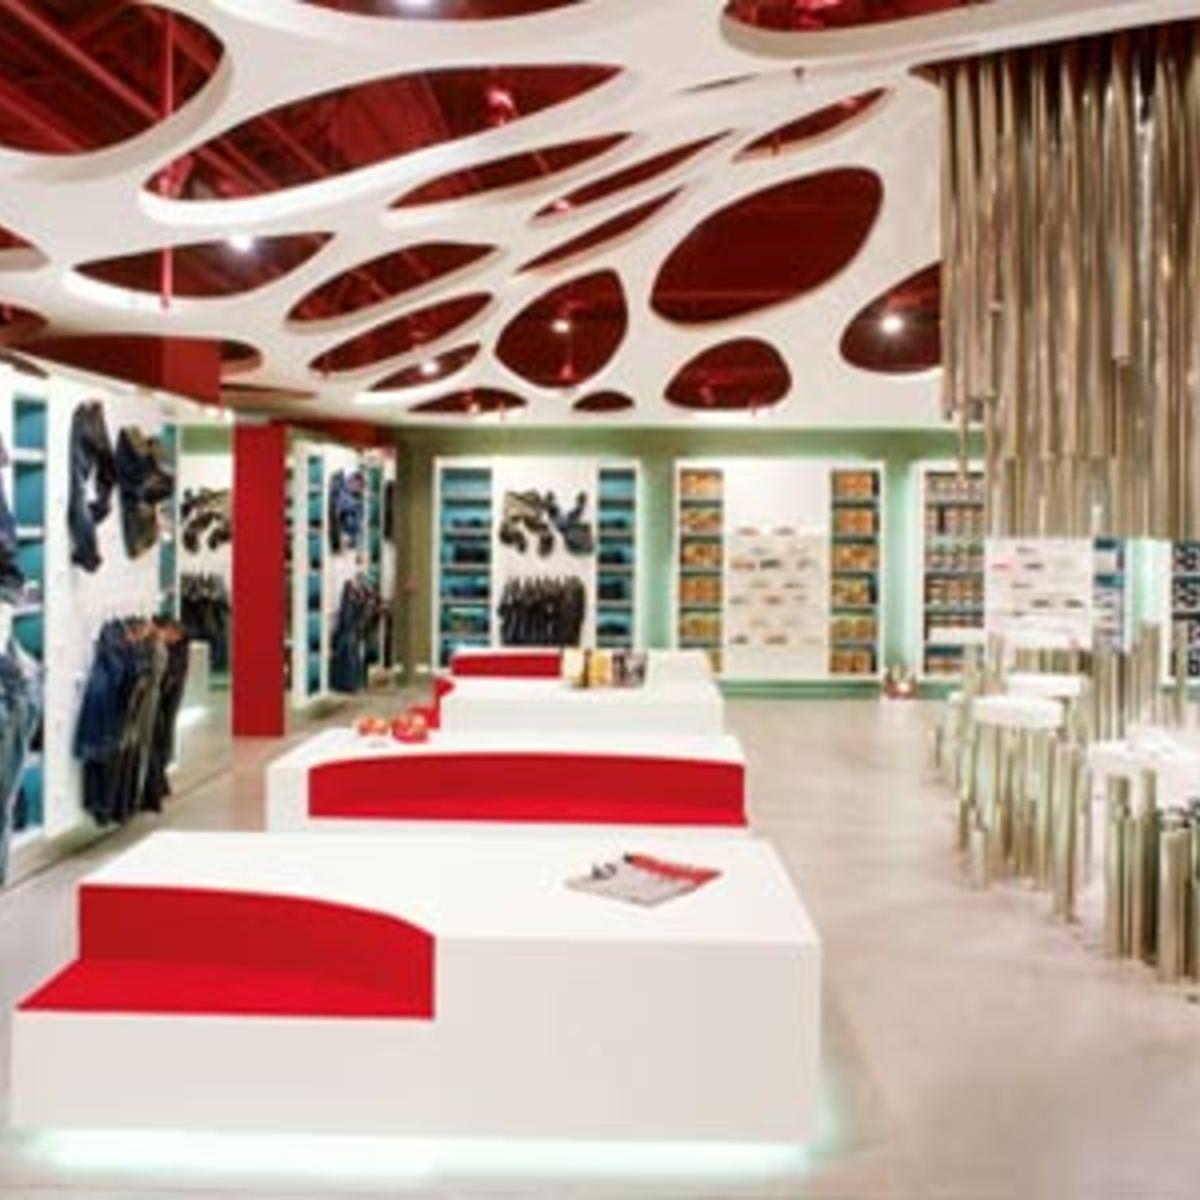 Novo - Studio 63 Architecture + Design<br /> Hong Kong, 2007